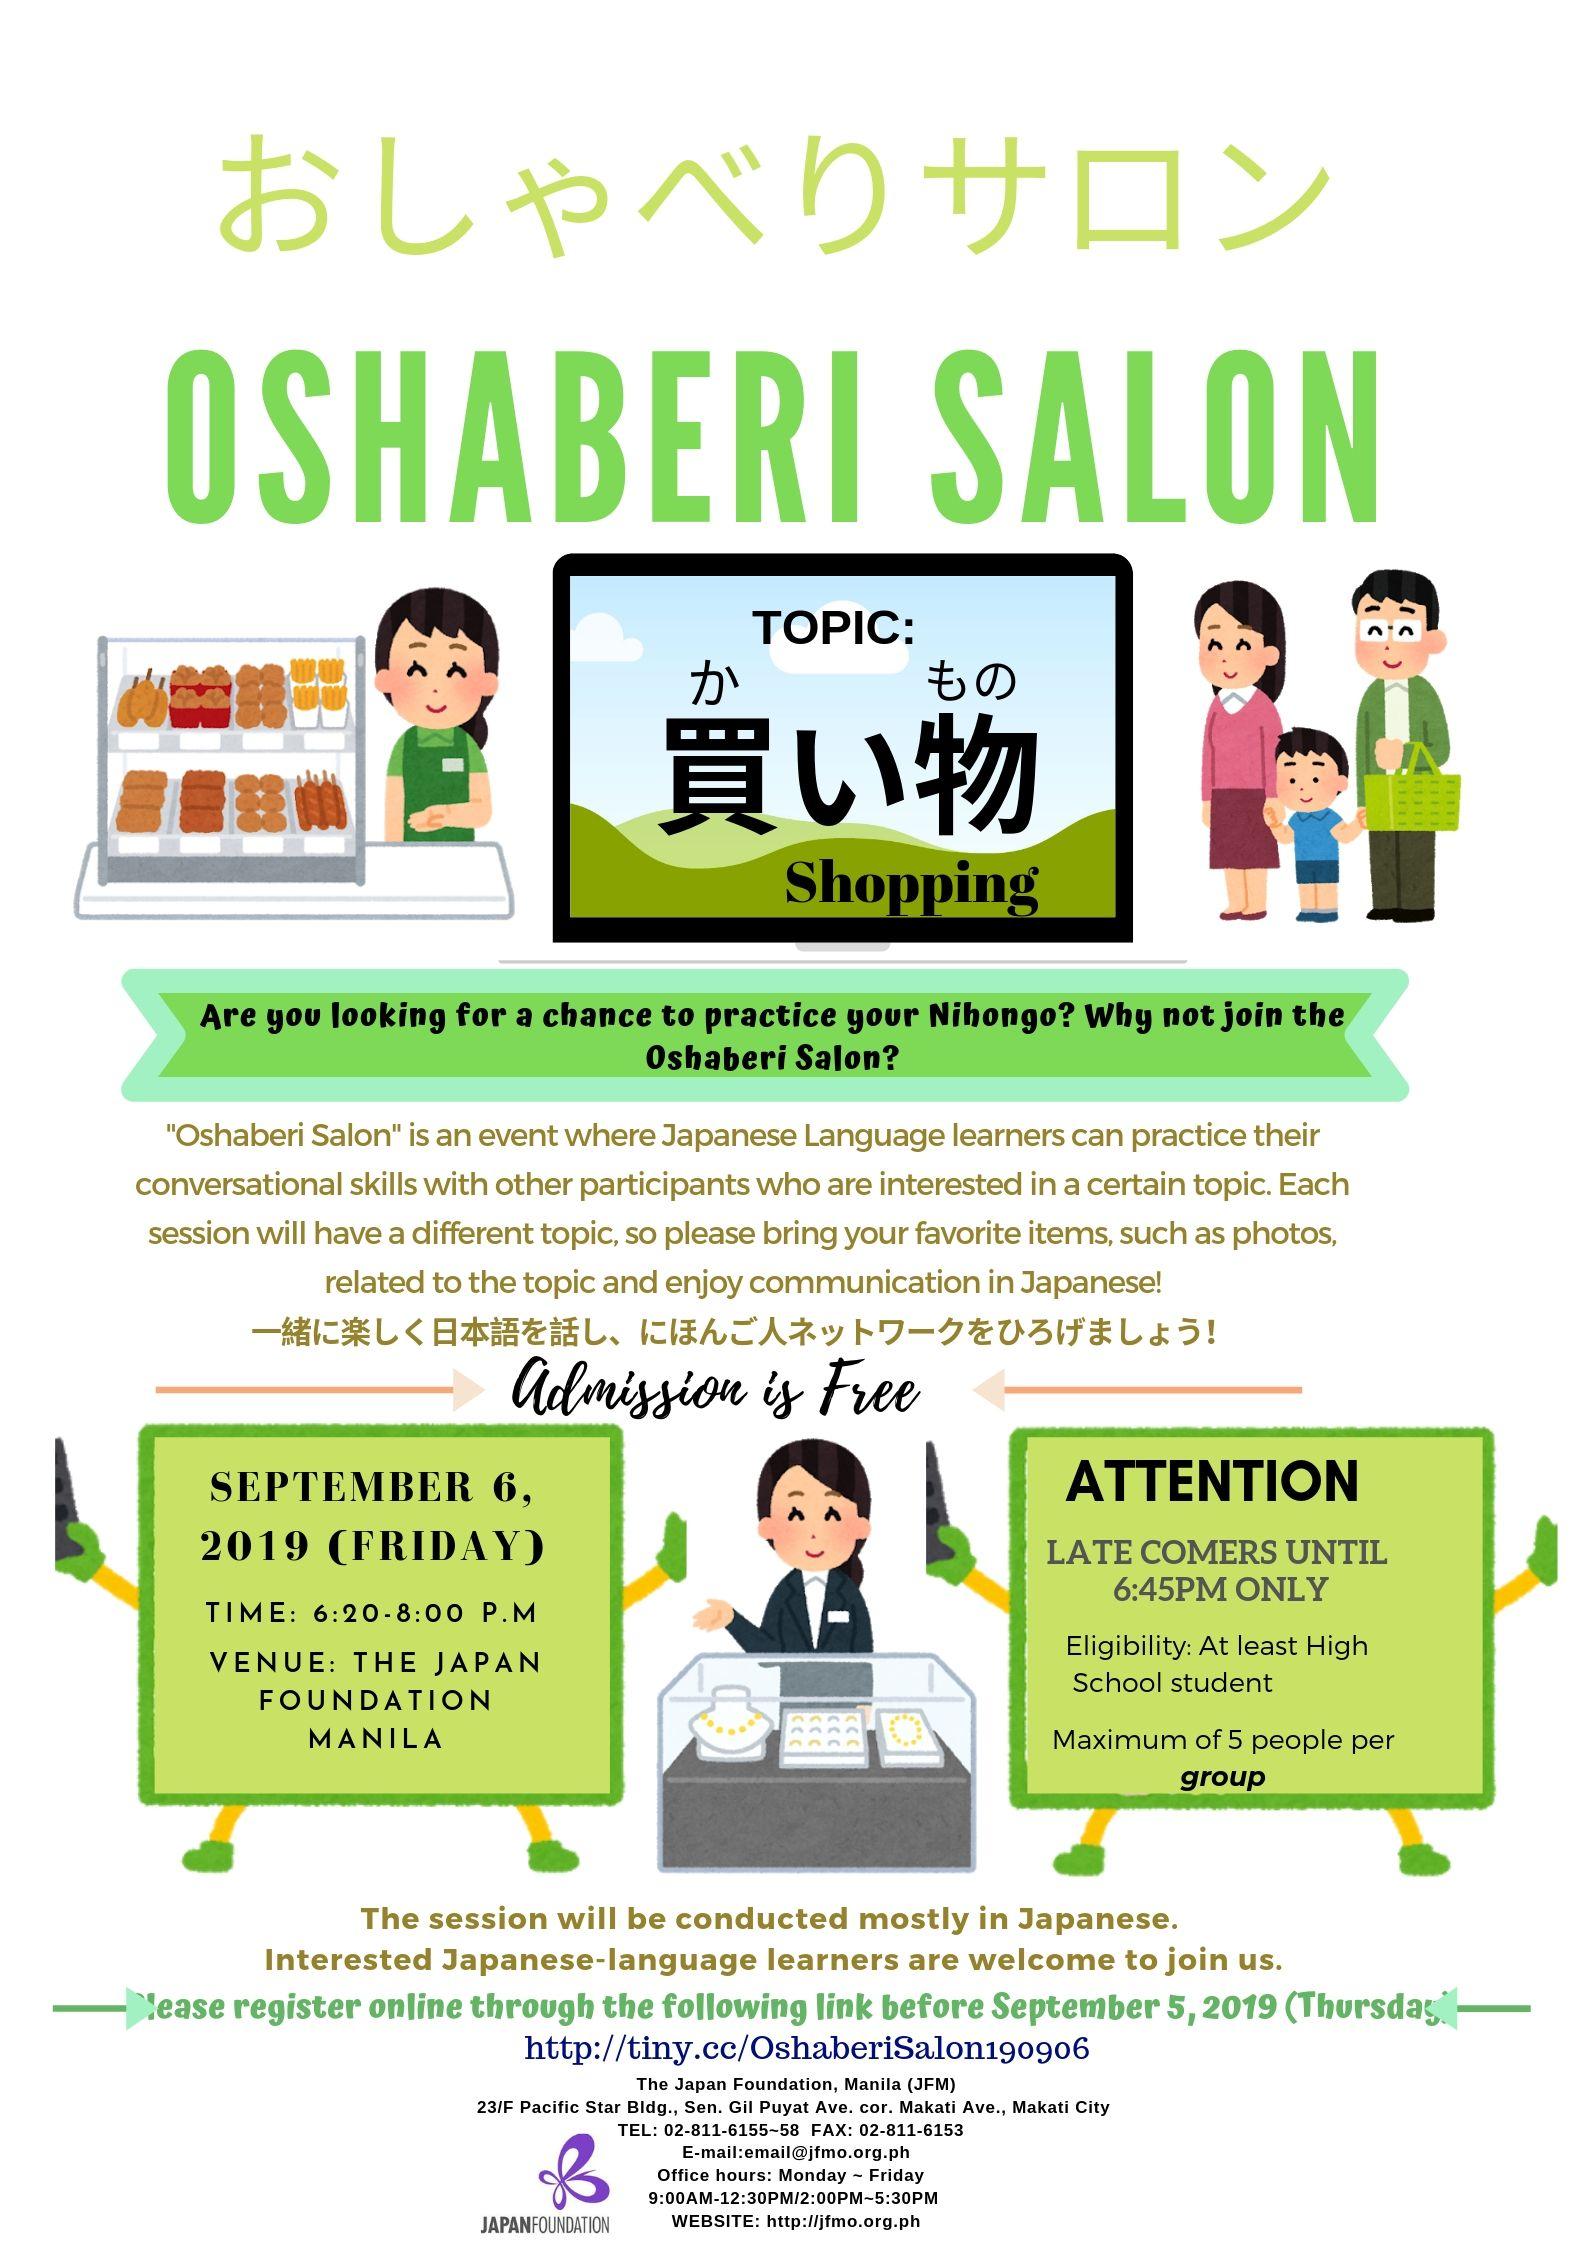 Oshaberi Salon: 買い物 (Shopping)